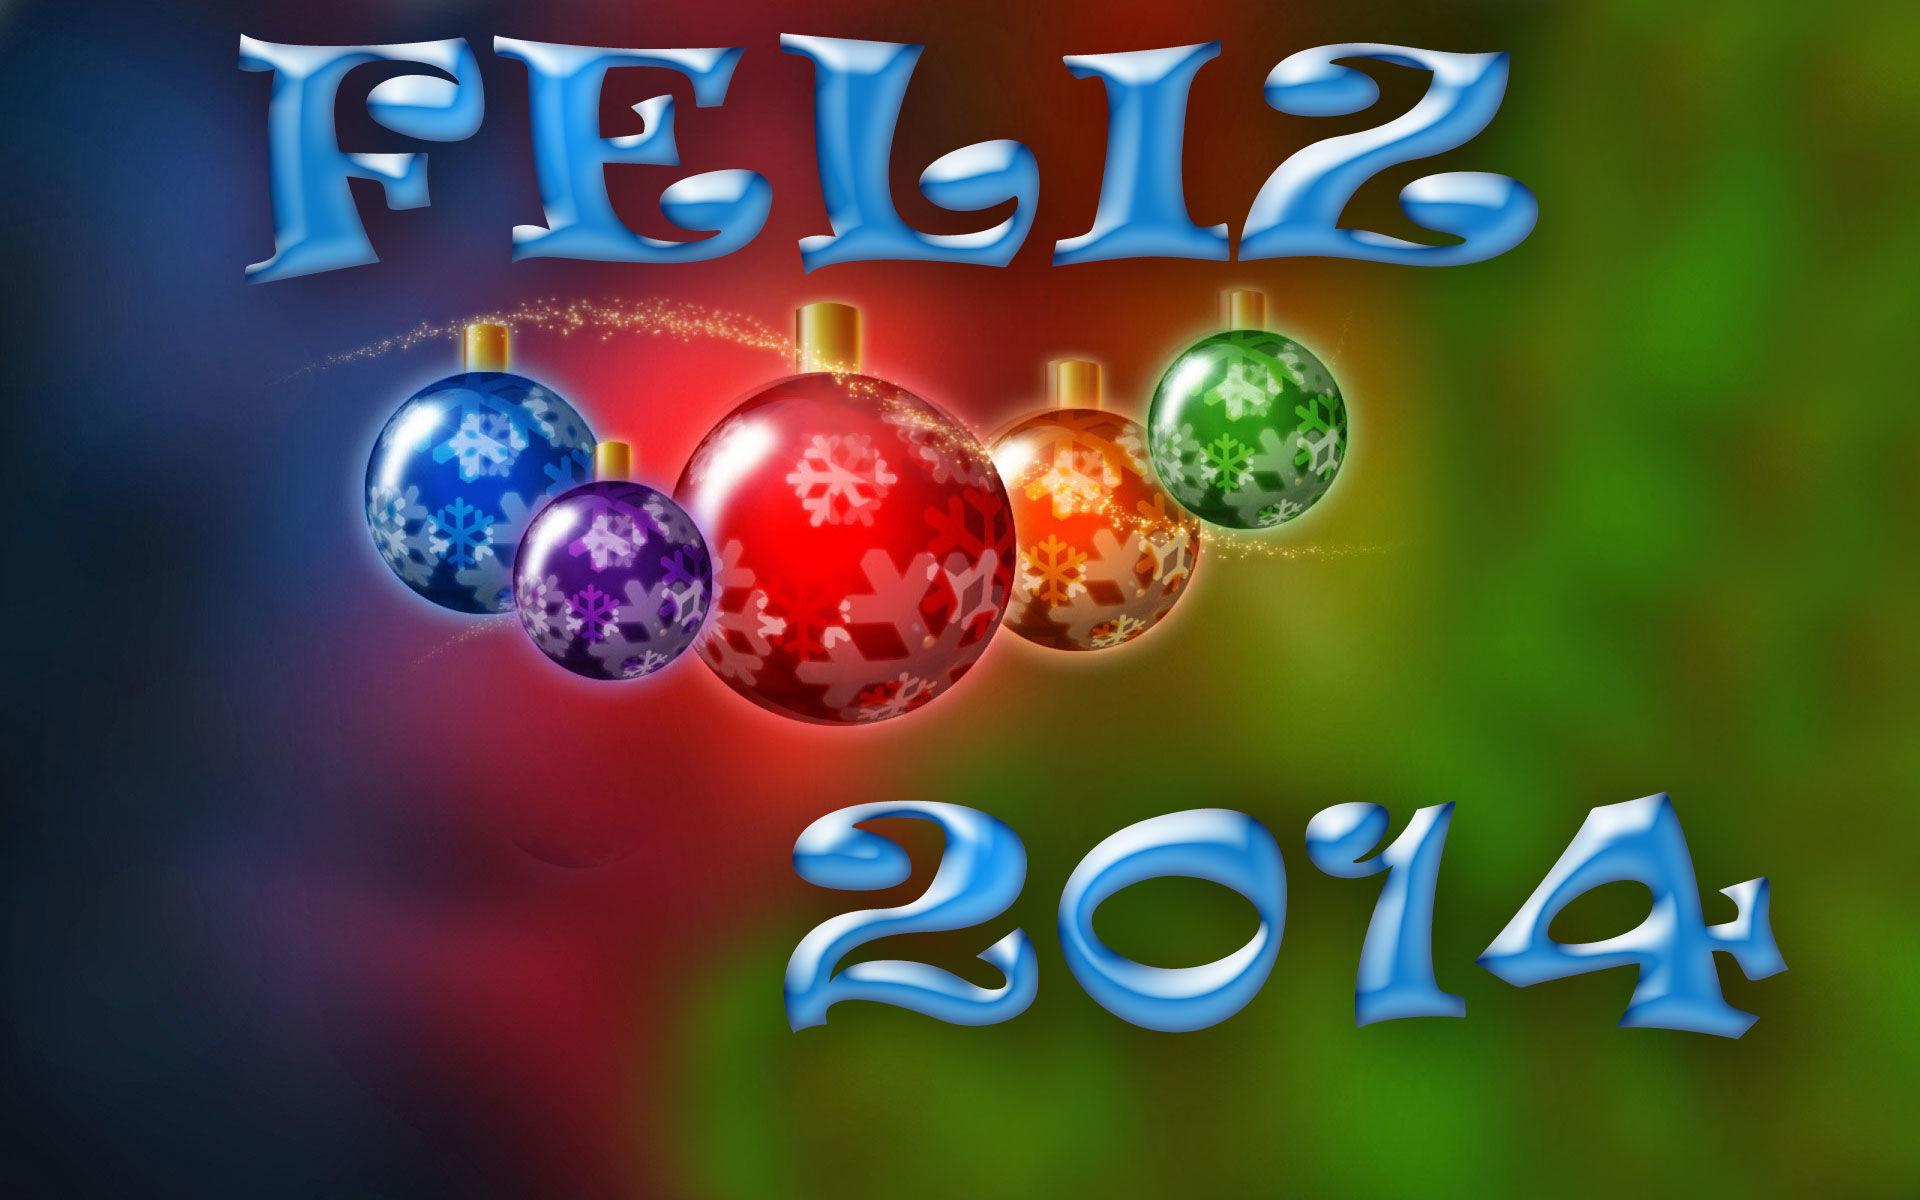 http://www.clickgratis.com.br/_upload/scraps/2013/12/26/feliz-2014-v-52bc5476deab8.jpg